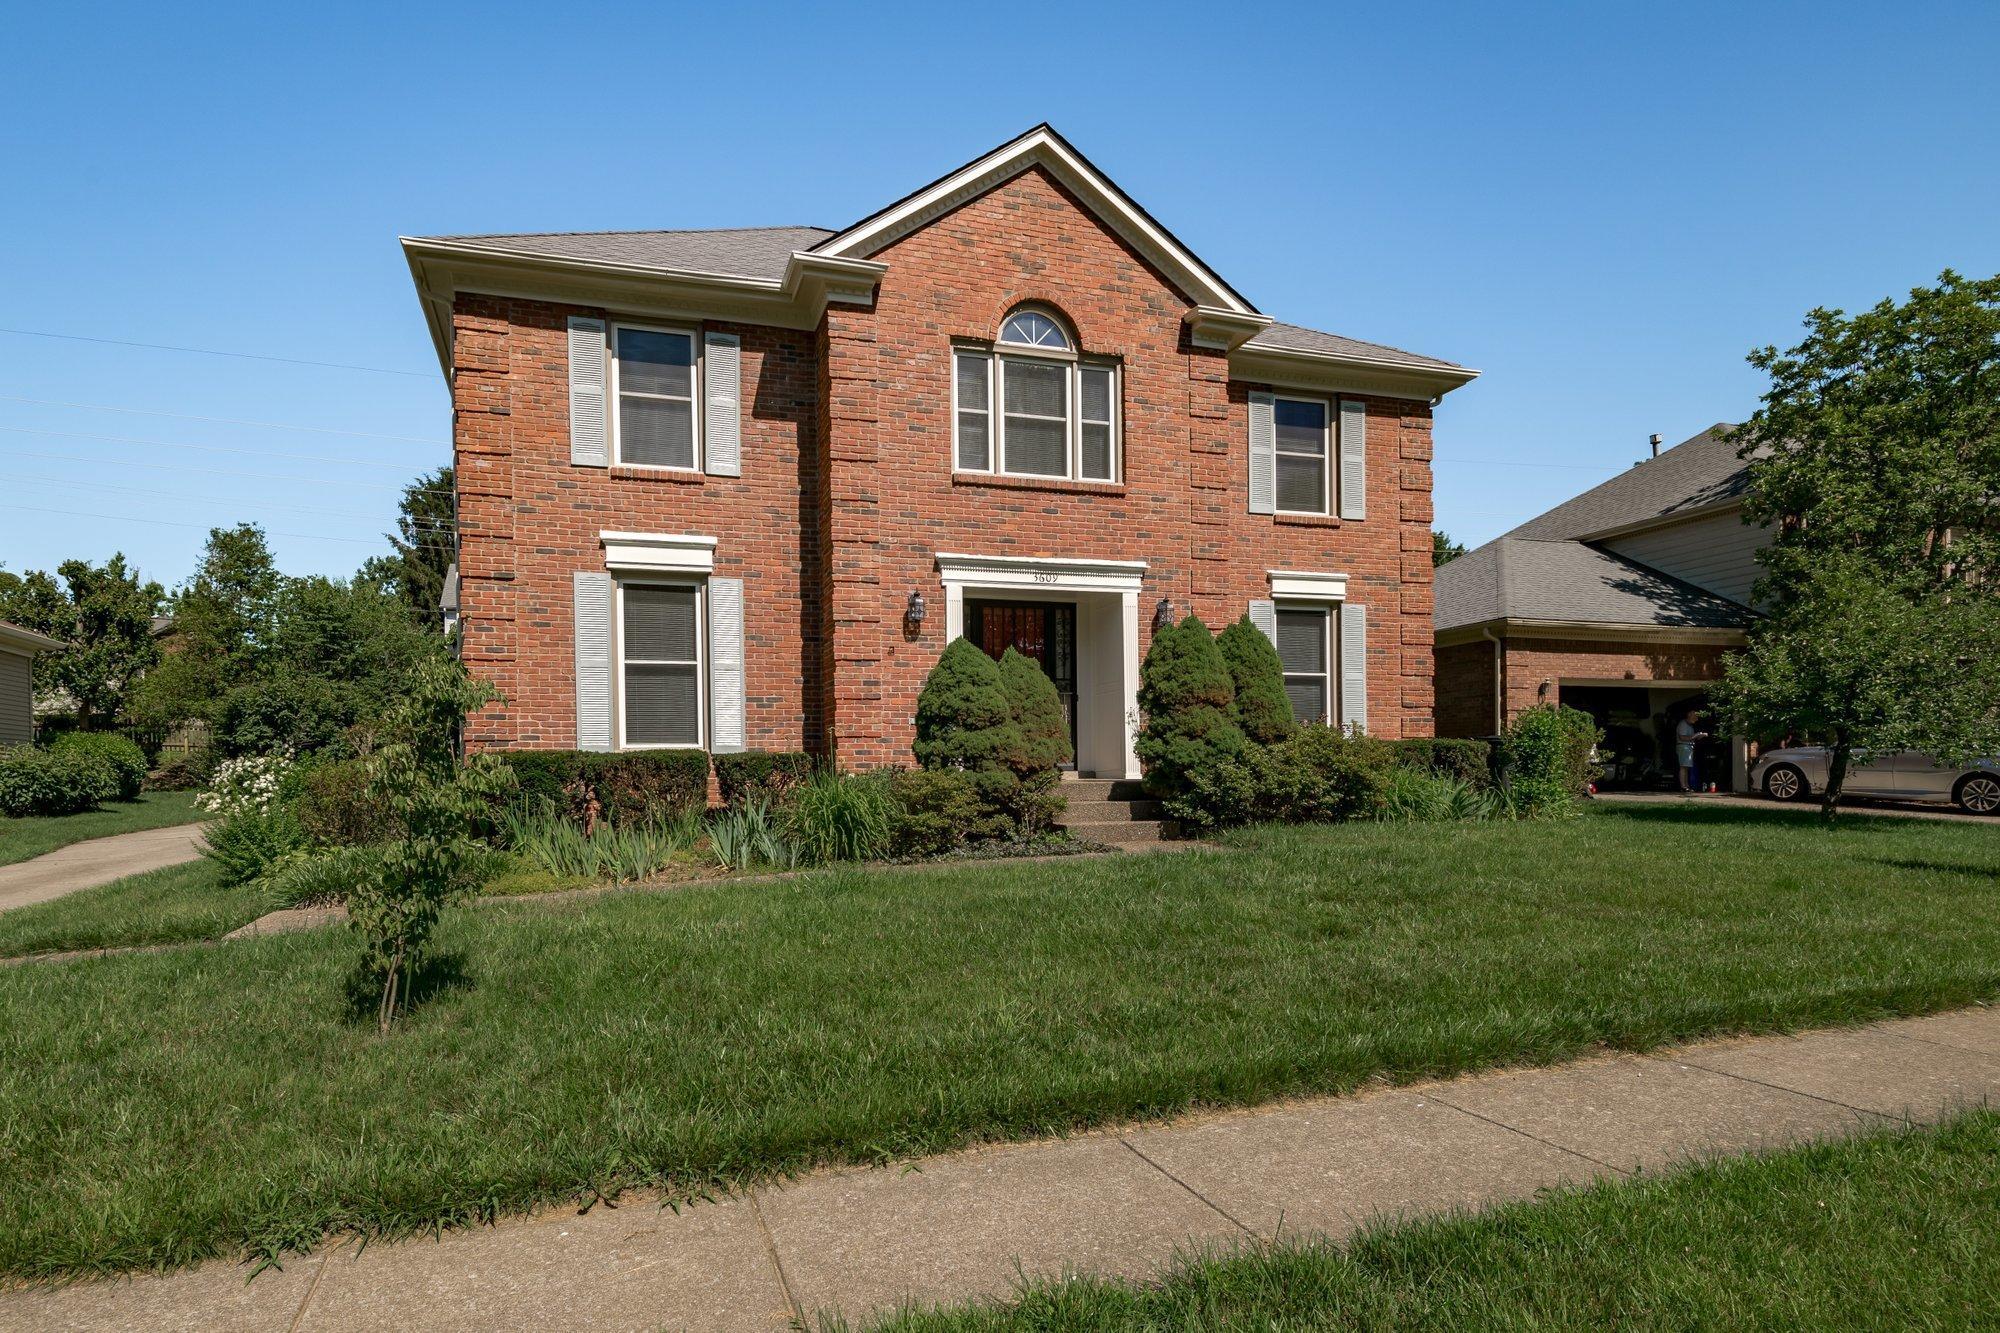 3609 Timberwood Lane, Lexington, Kentucky 40515, 4 Bedrooms Bedrooms, ,2 BathroomsBathrooms,Residential,For Sale,Timberwood,20111349